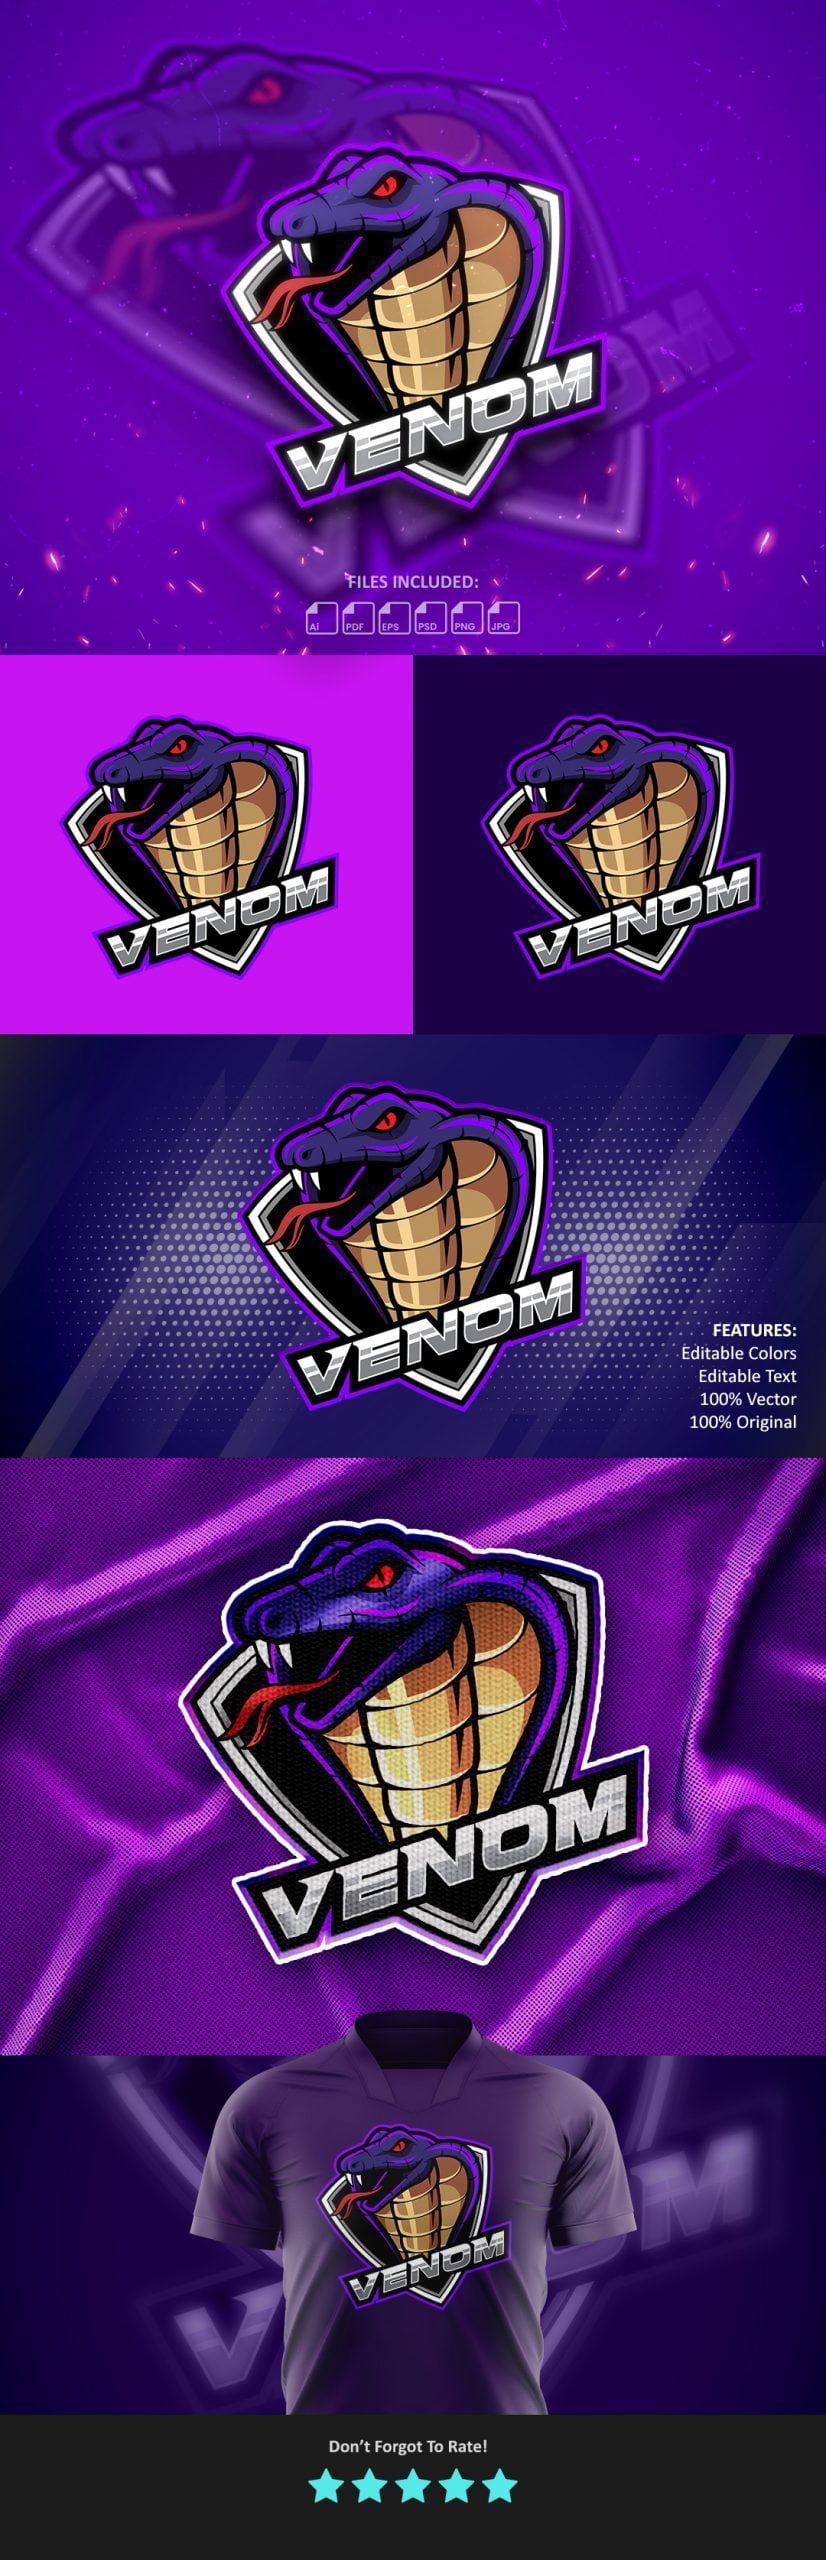 Venom-Mascot-Gaming-Logo-Preview-Generator